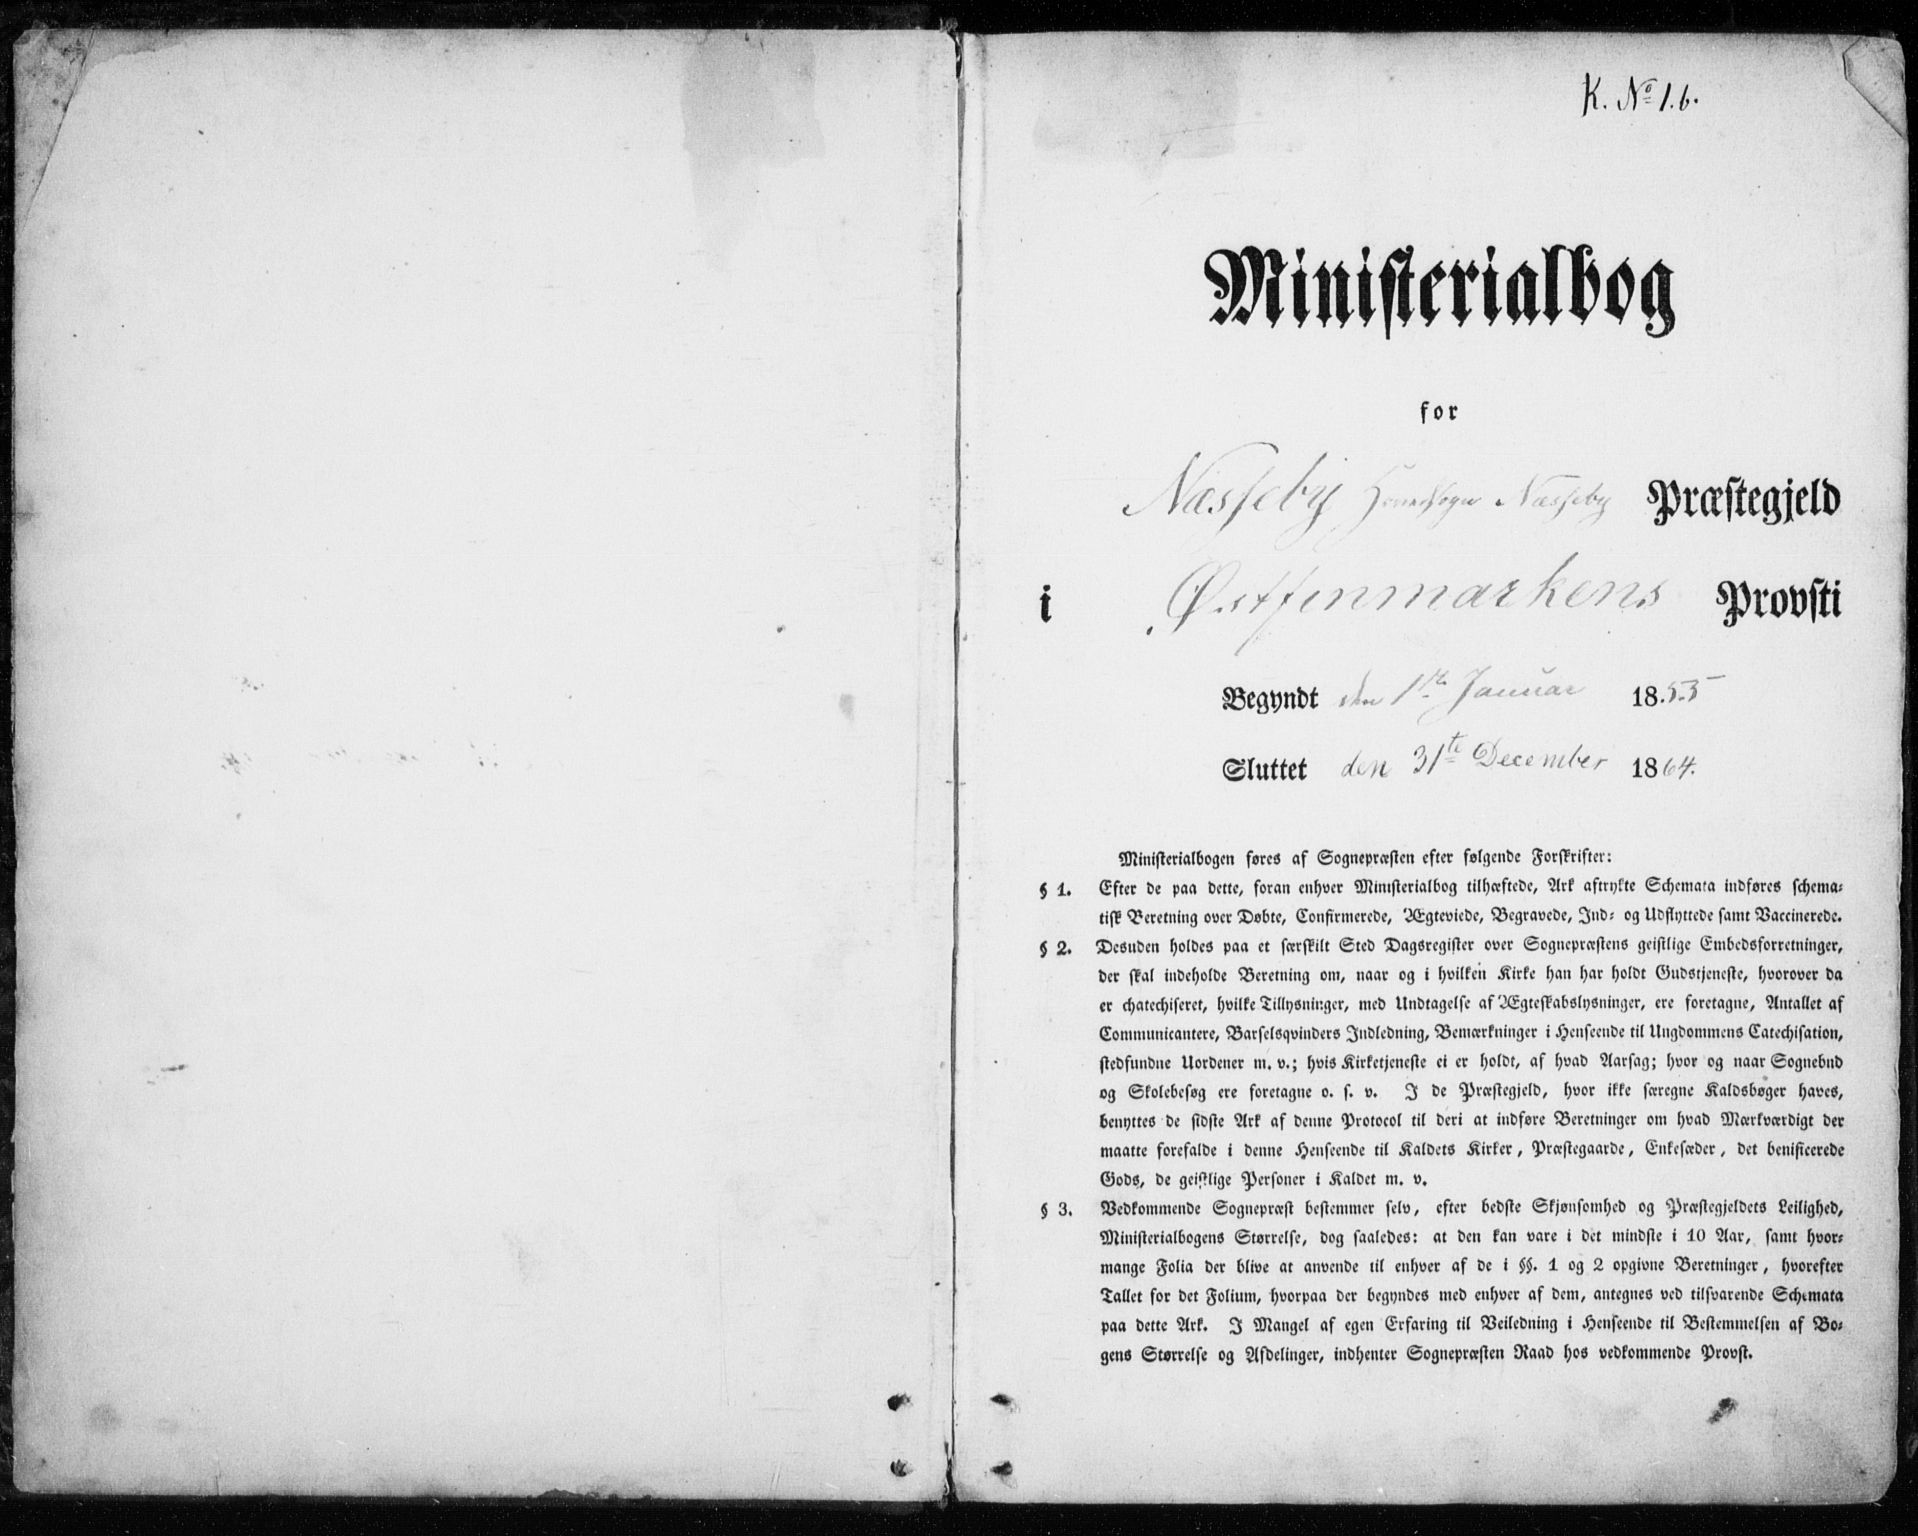 SATØ, Nesseby sokneprestkontor, H/Ha/L0002kirke: Ministerialbok nr. 2, 1856-1864